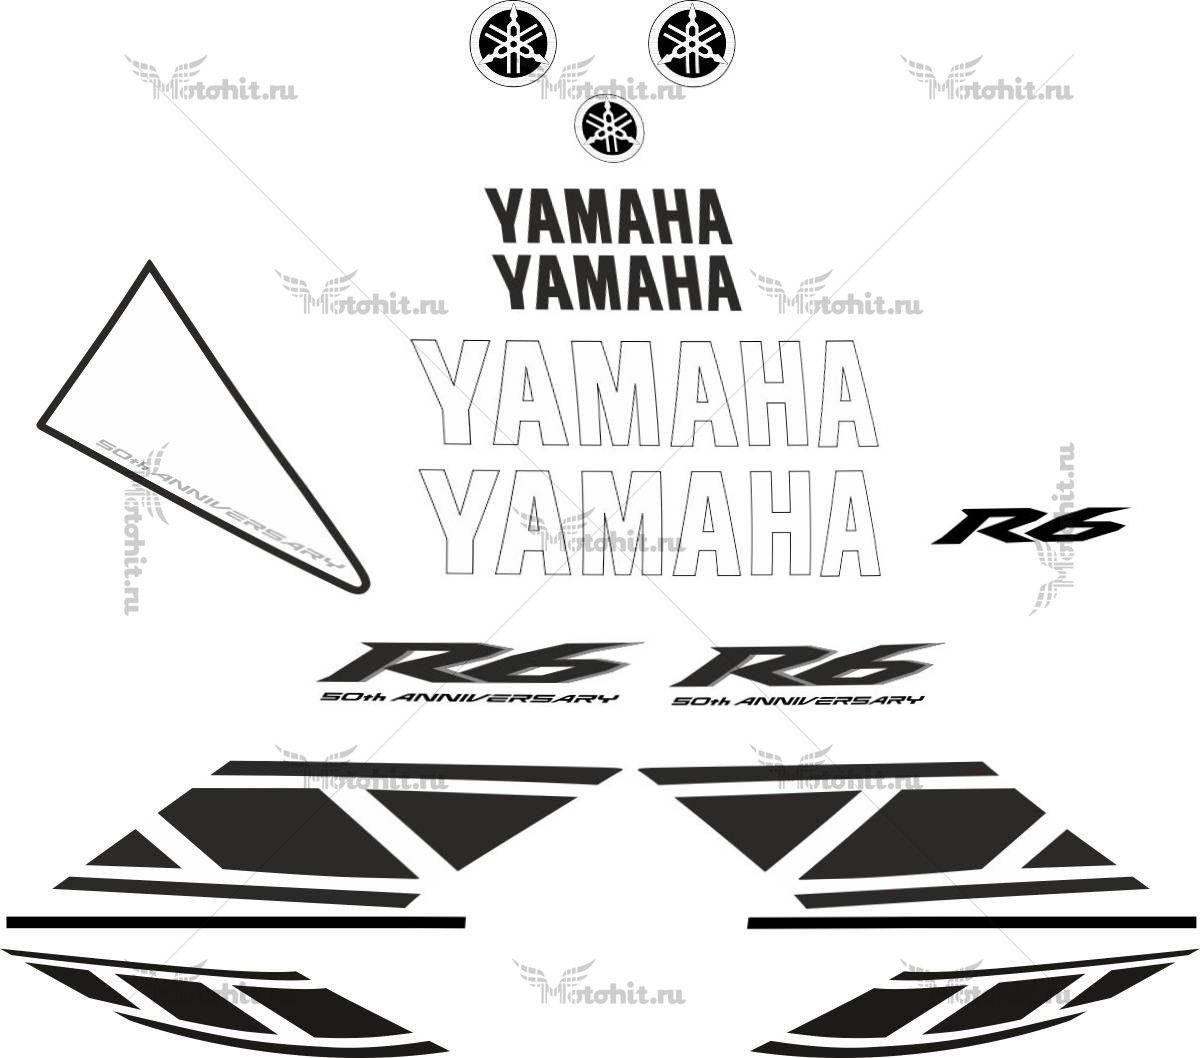 Комплект наклеек Yamaha YZF-R6 2007 WHITE-BLACK